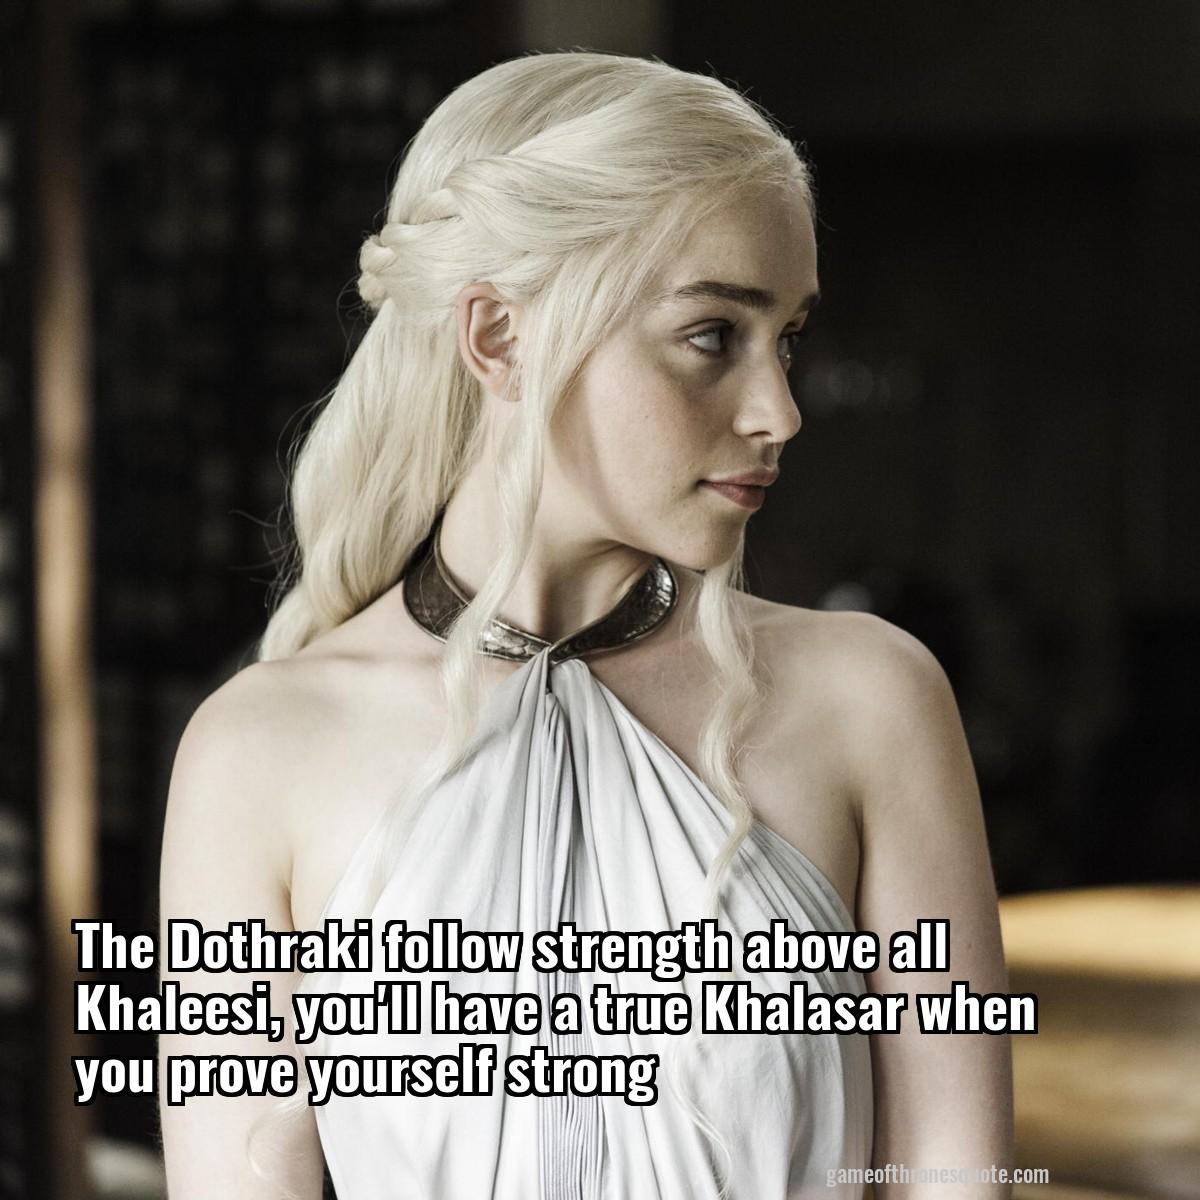 Daenerys Targaryen: The Dothraki follow strength above all Khaleesi, you...